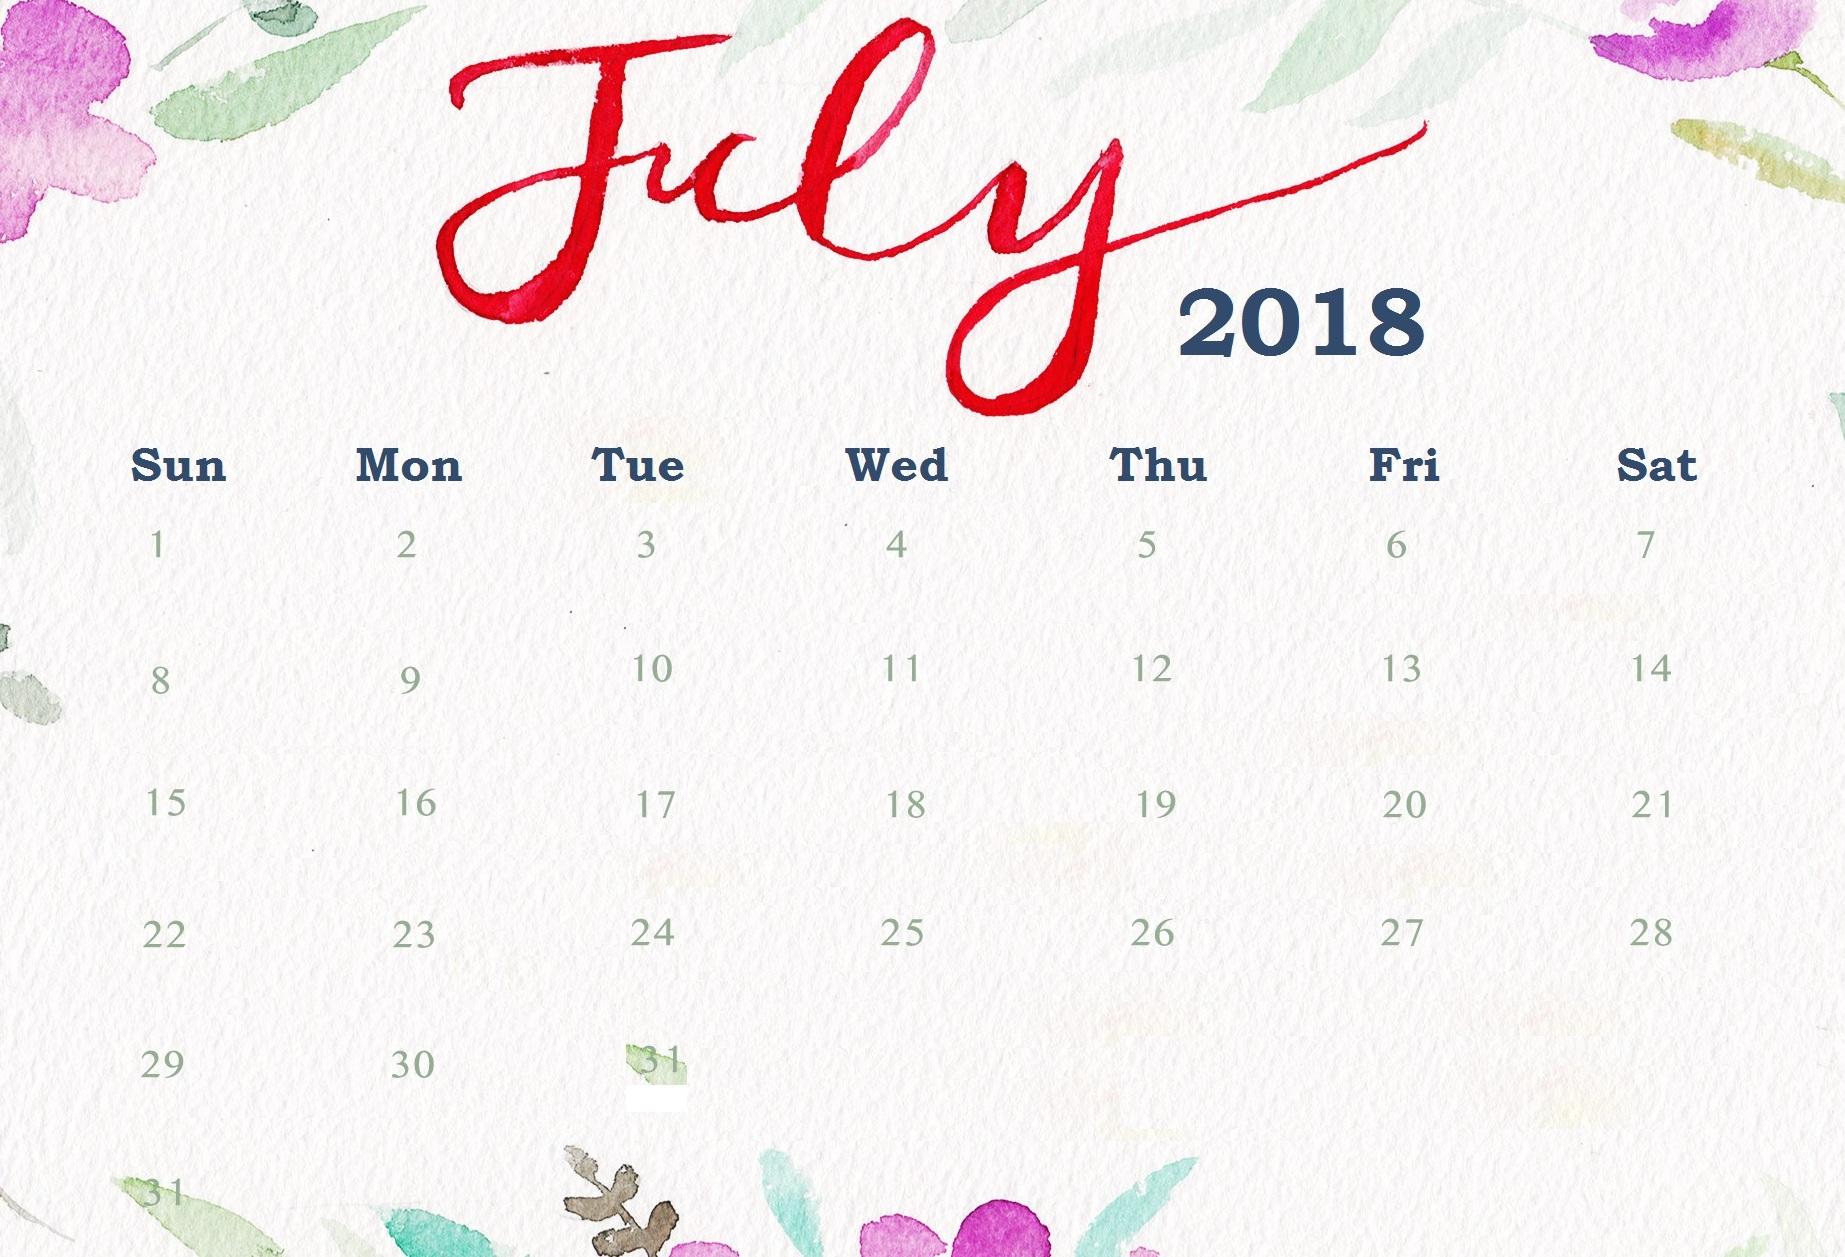 July 2018 Calendar Printable | Printable 2019 Calendar Templates Pdf pertaining to Cute Calendar Templates July